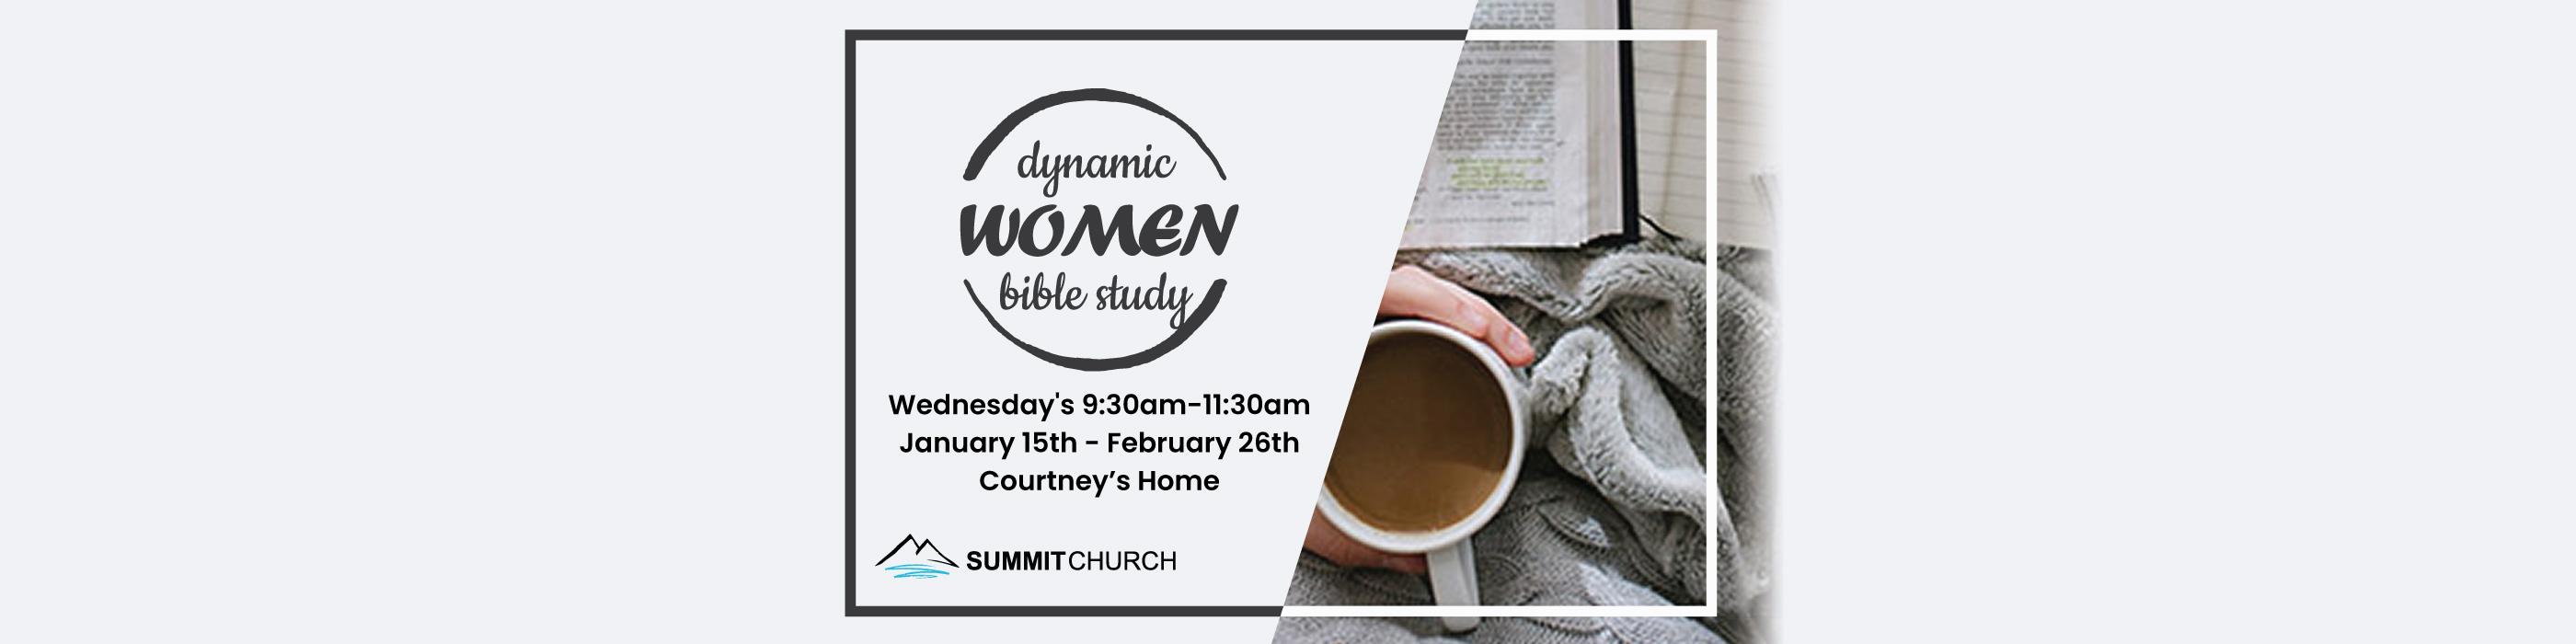 women-bible-winter-2020-WEB-2800x700